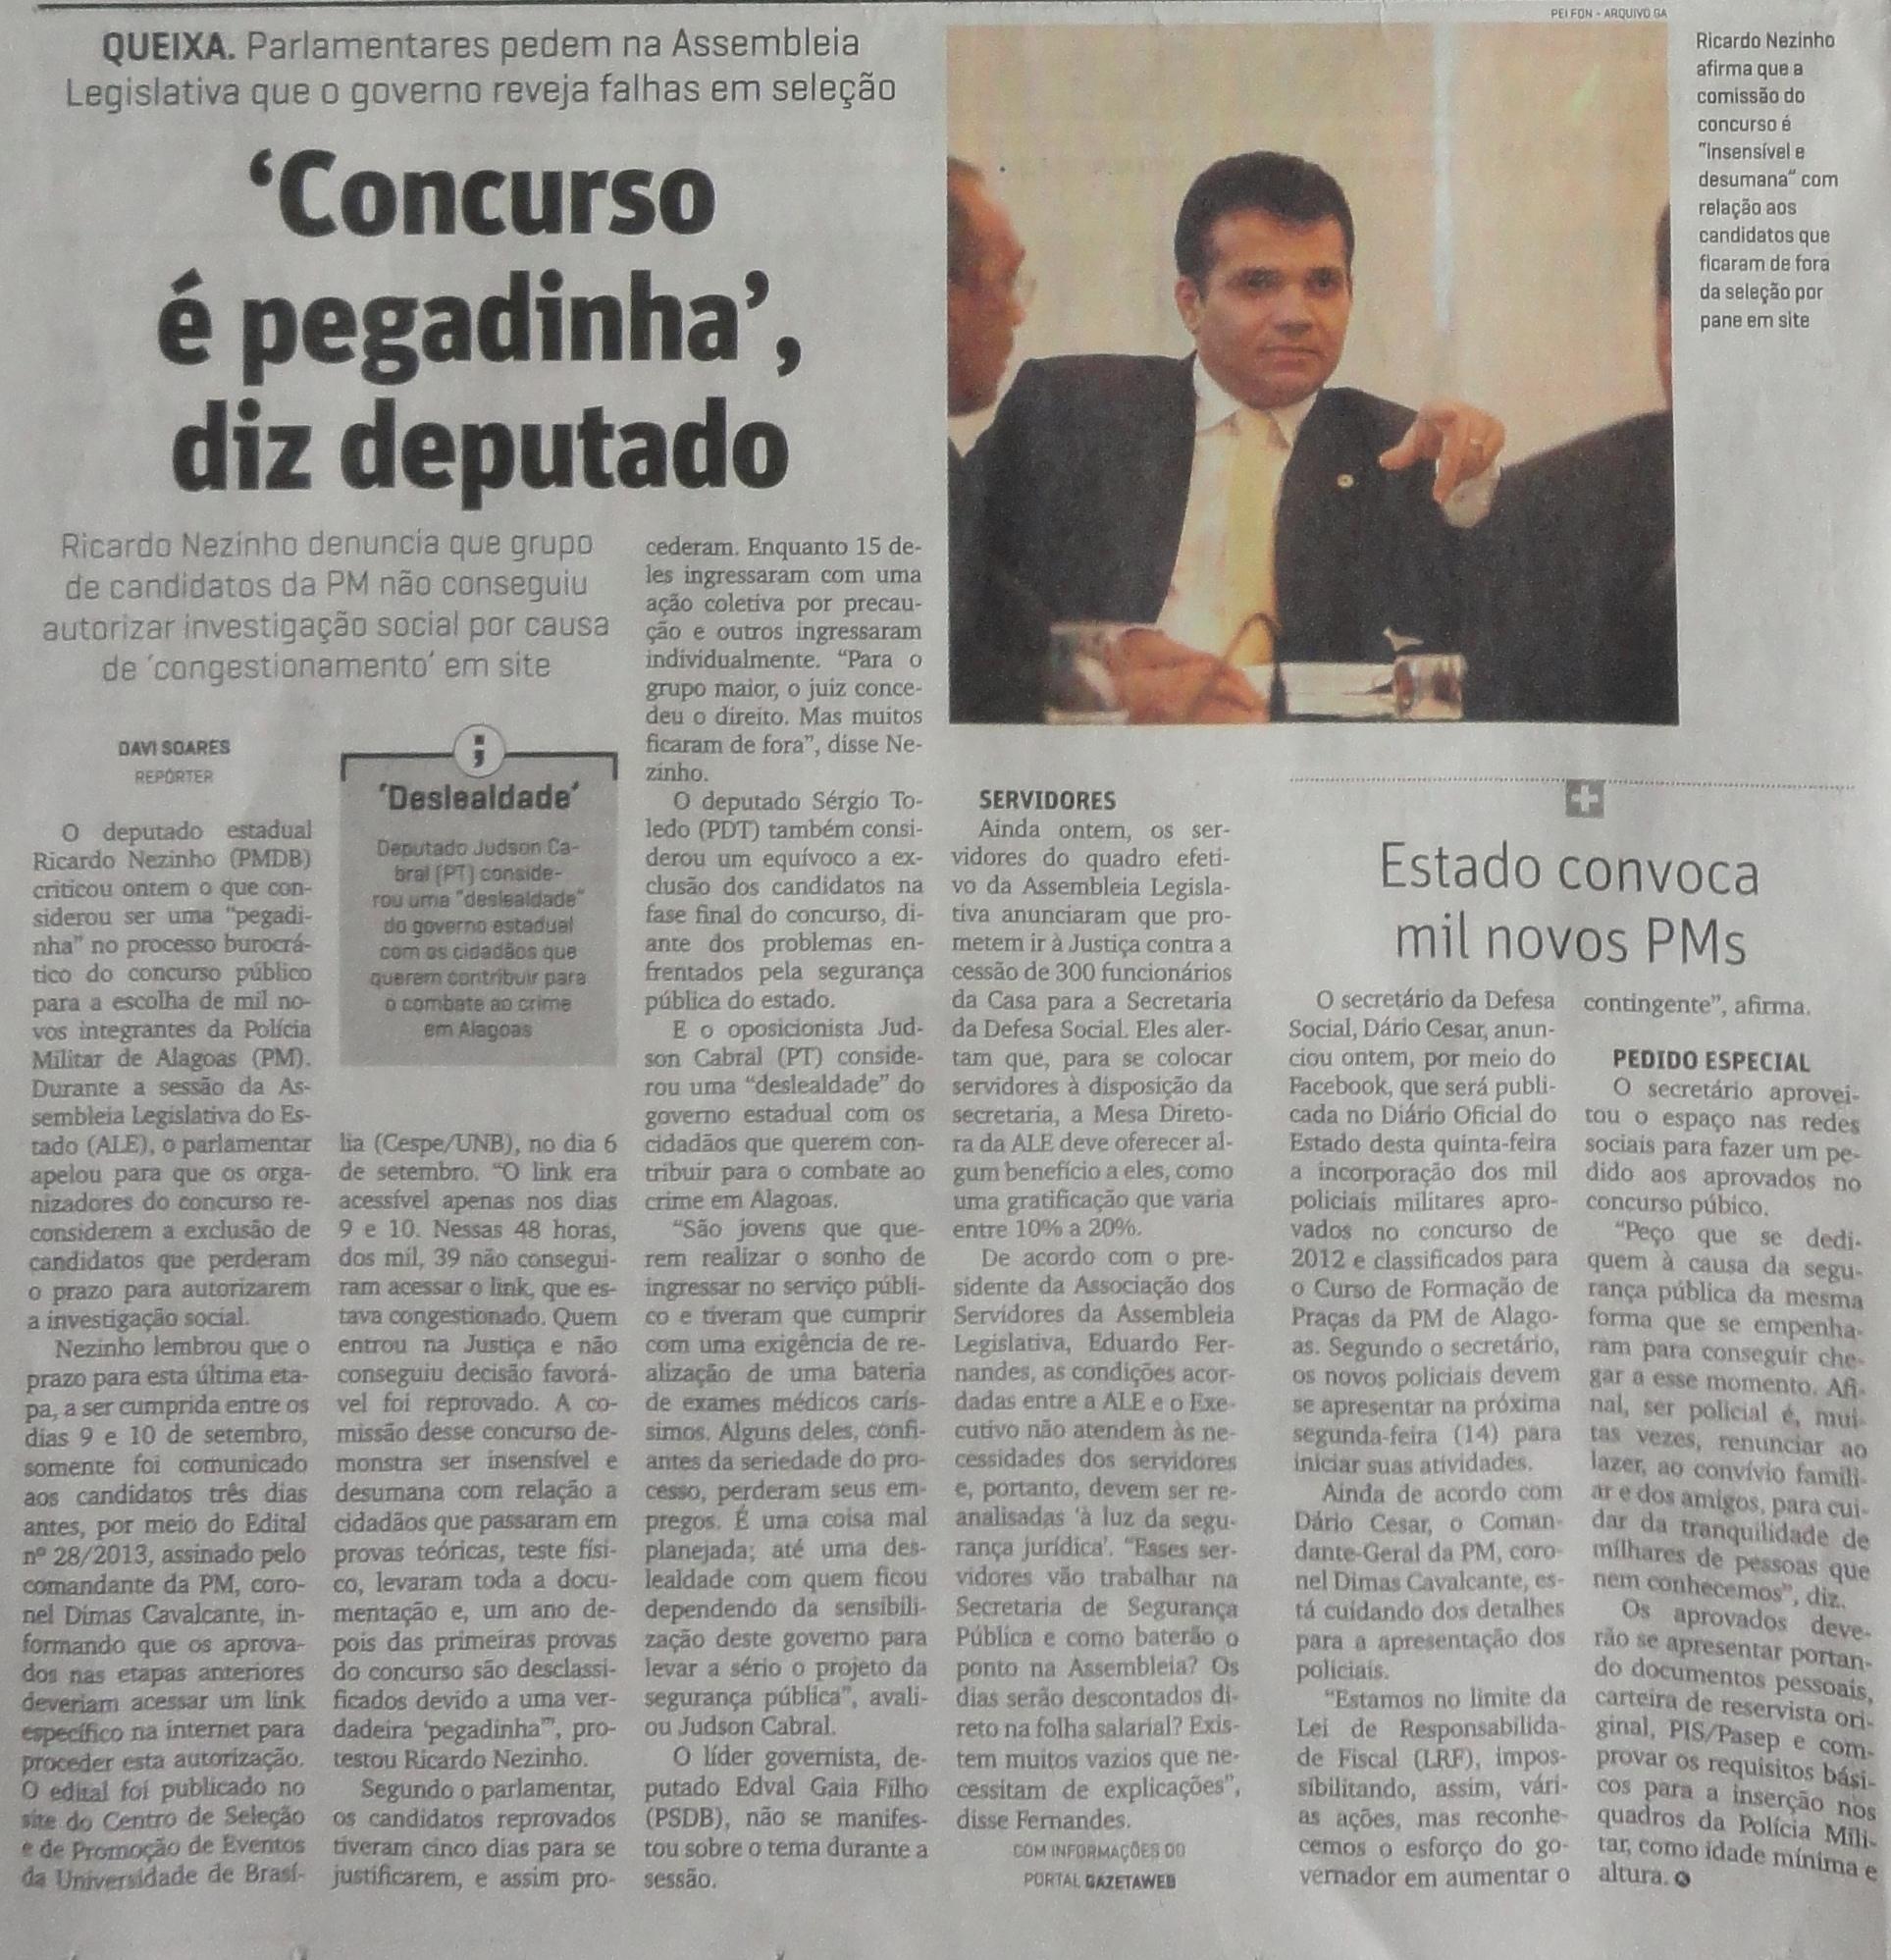 gazeta 09-10-13